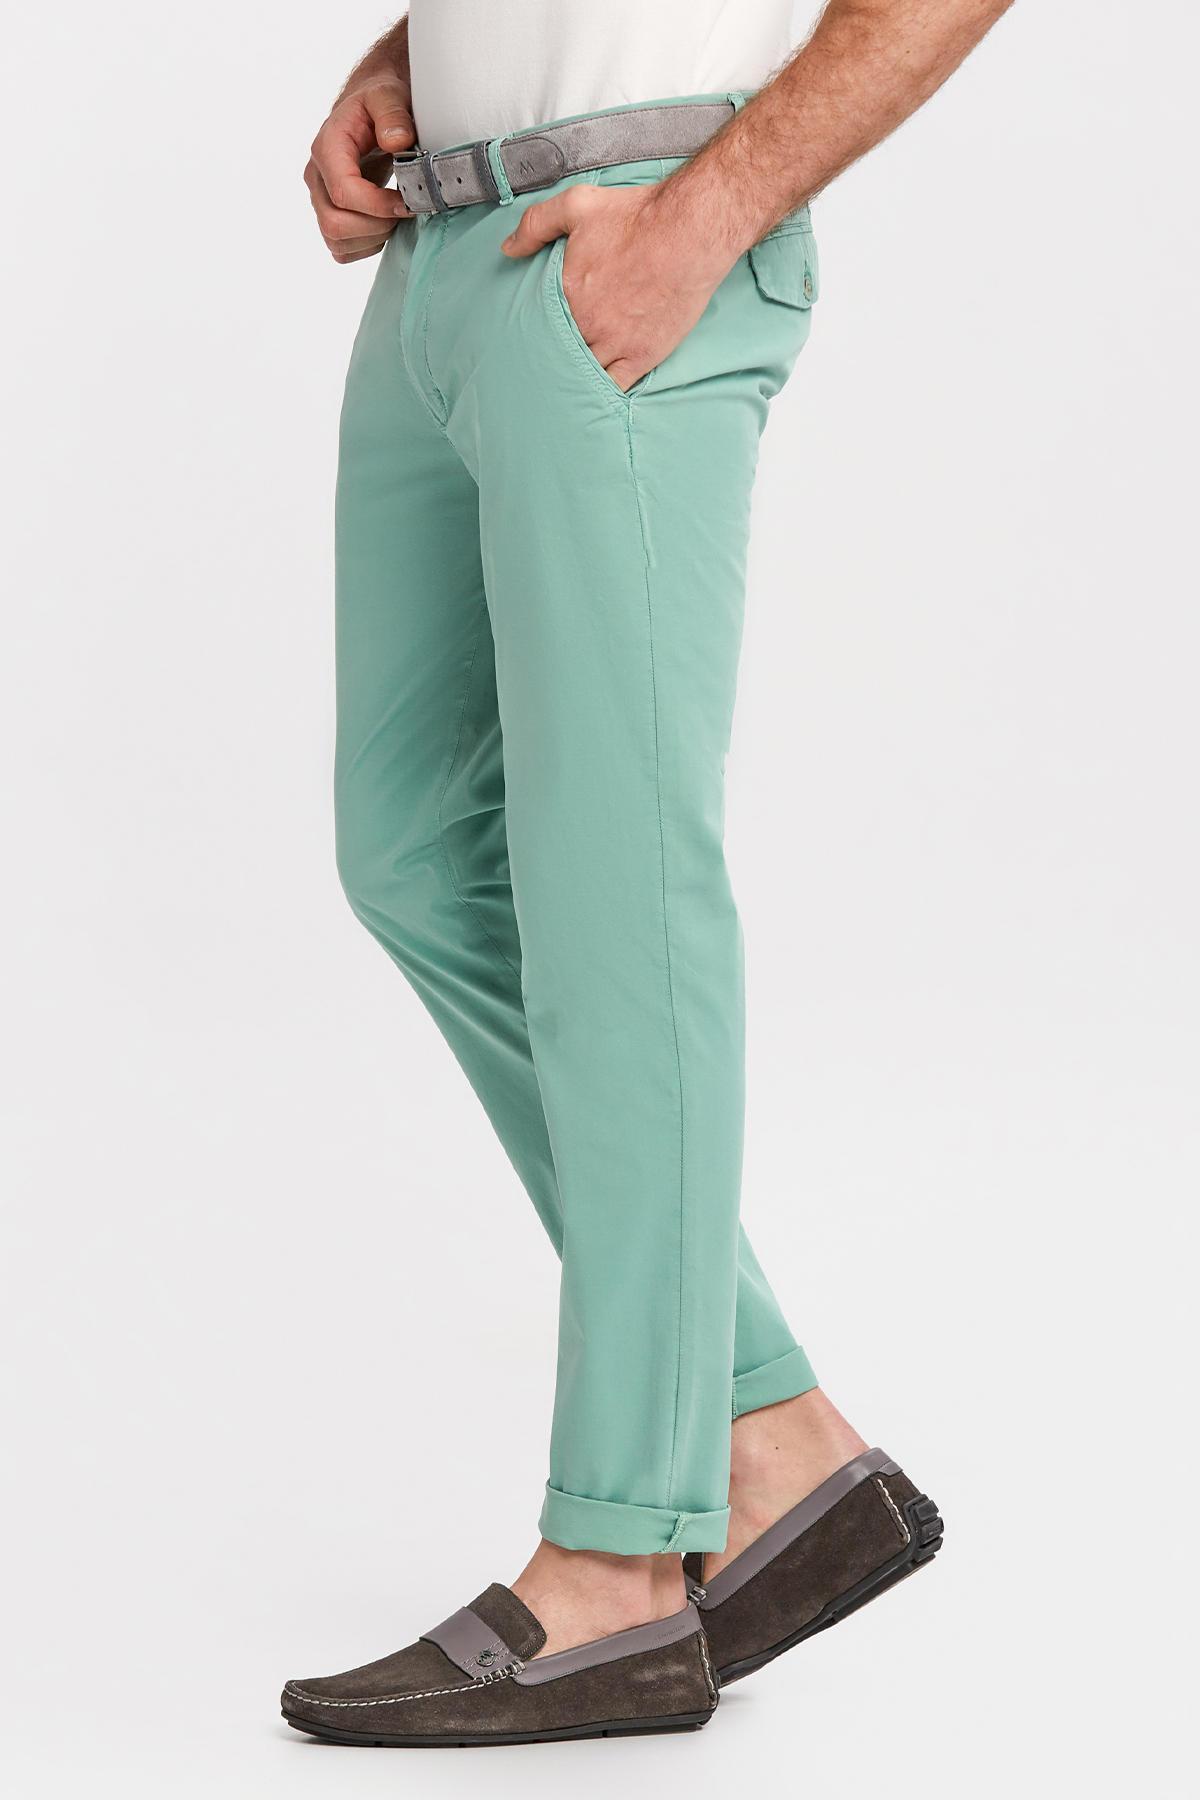 Açık Yeşil Pamuk Yazlık Chino Pantolon